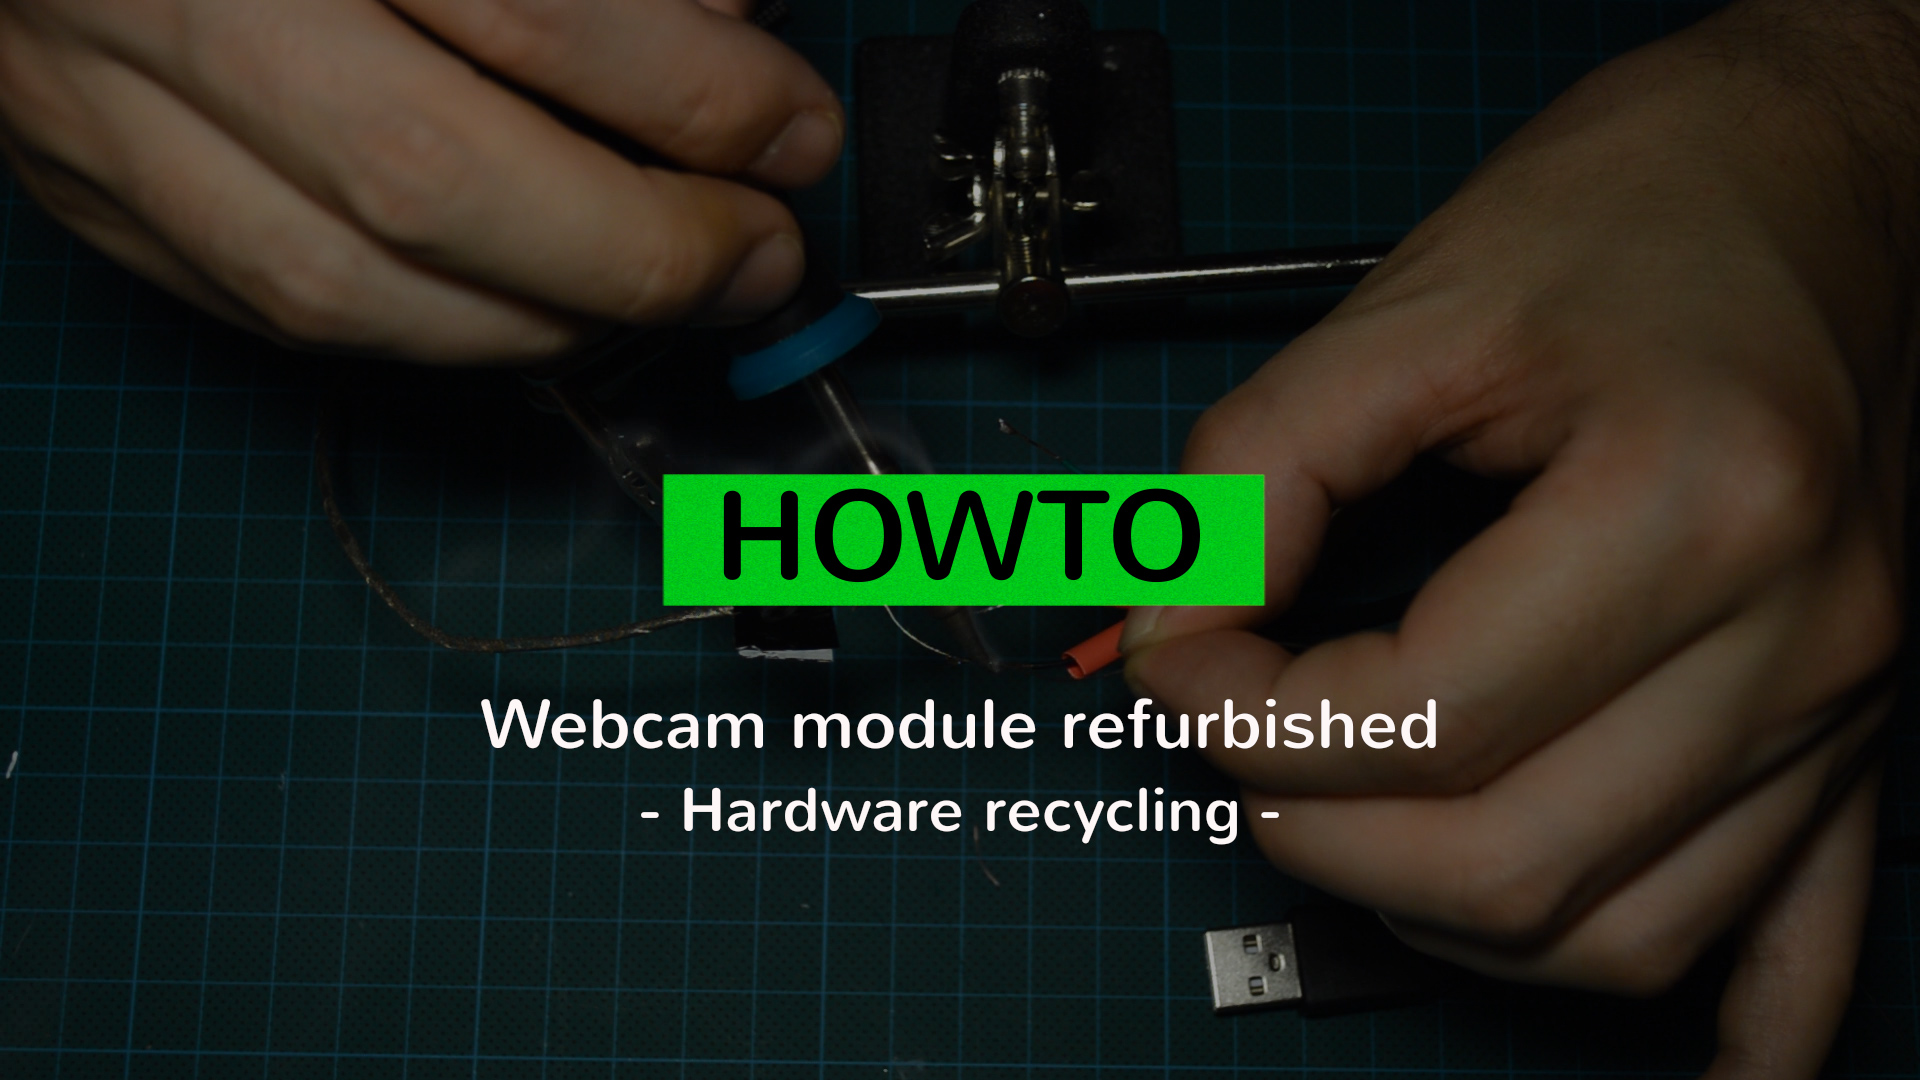 DIY - Repurpose a cam module